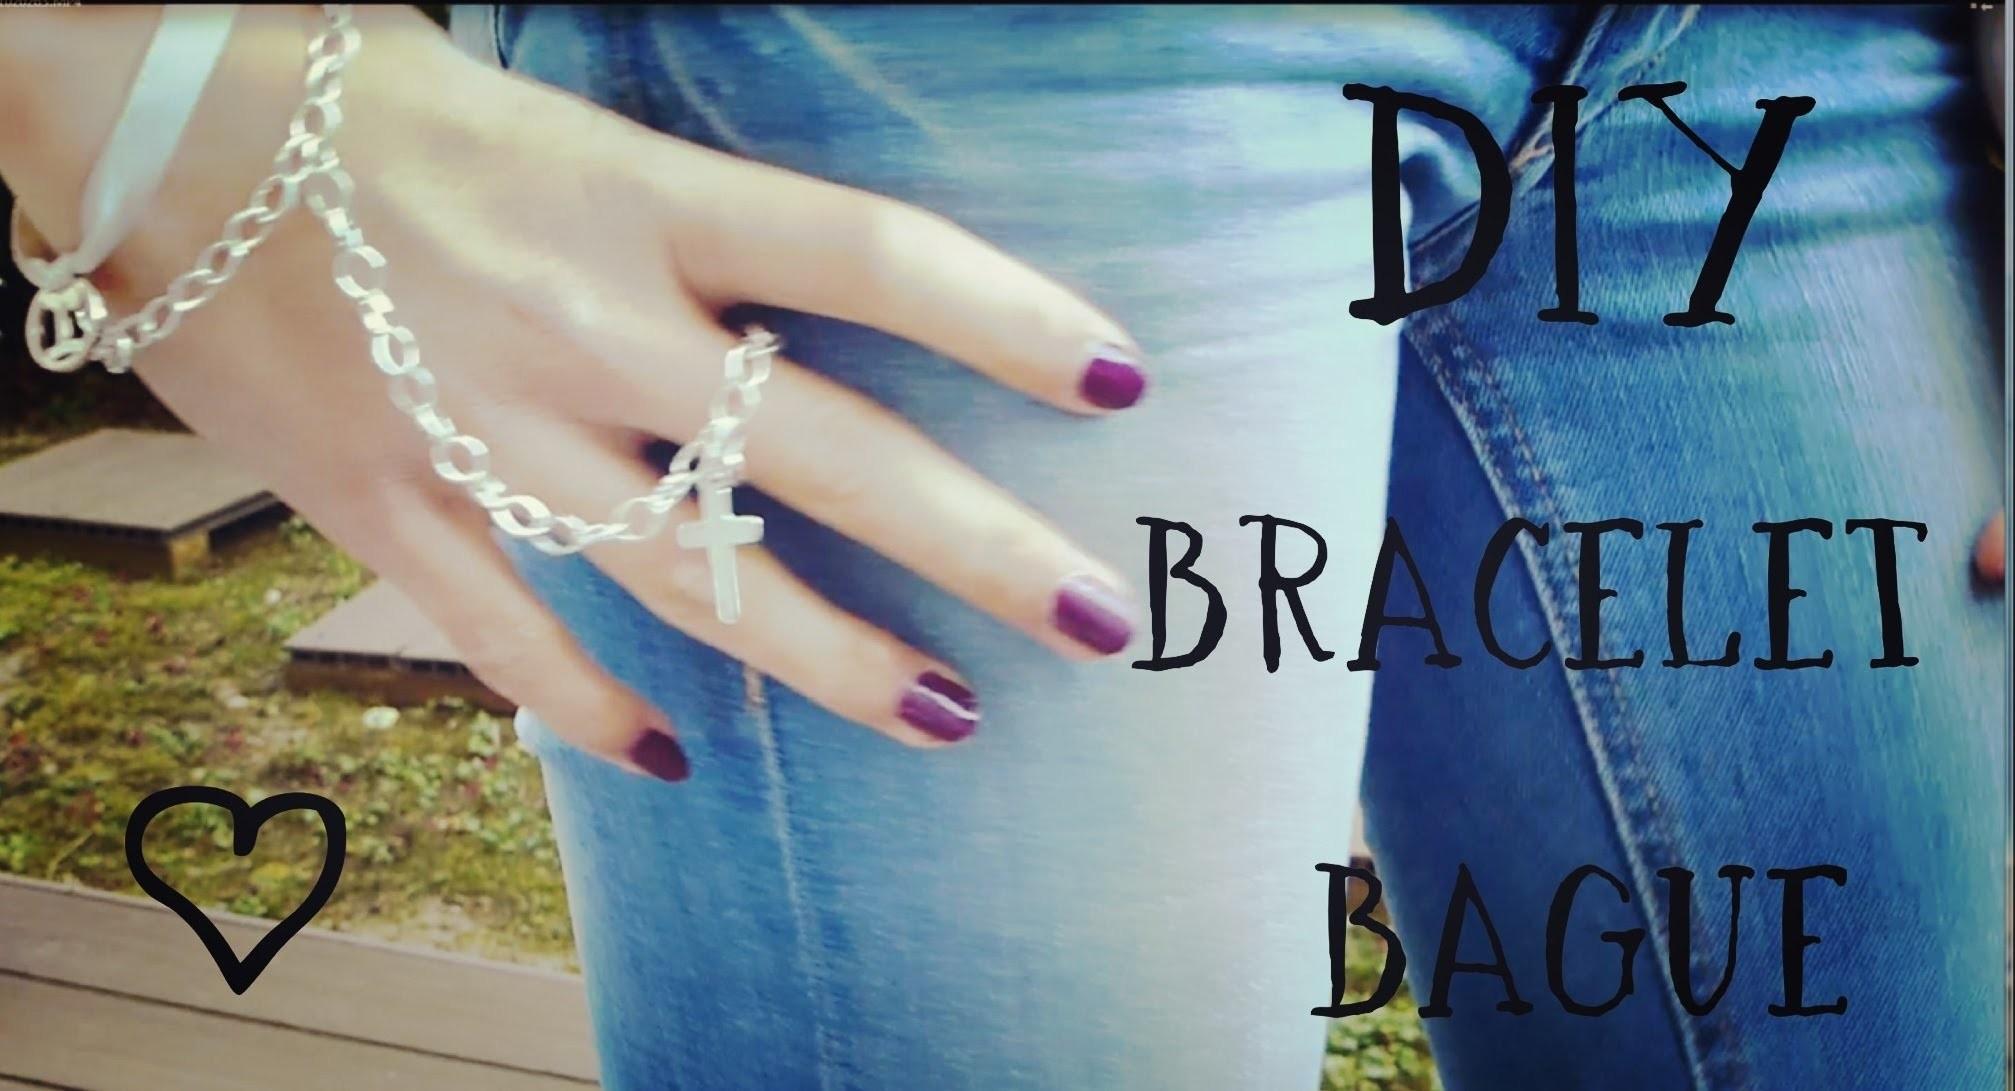 [DIY] Bracelet-Bague | Ring Bracelet with cross